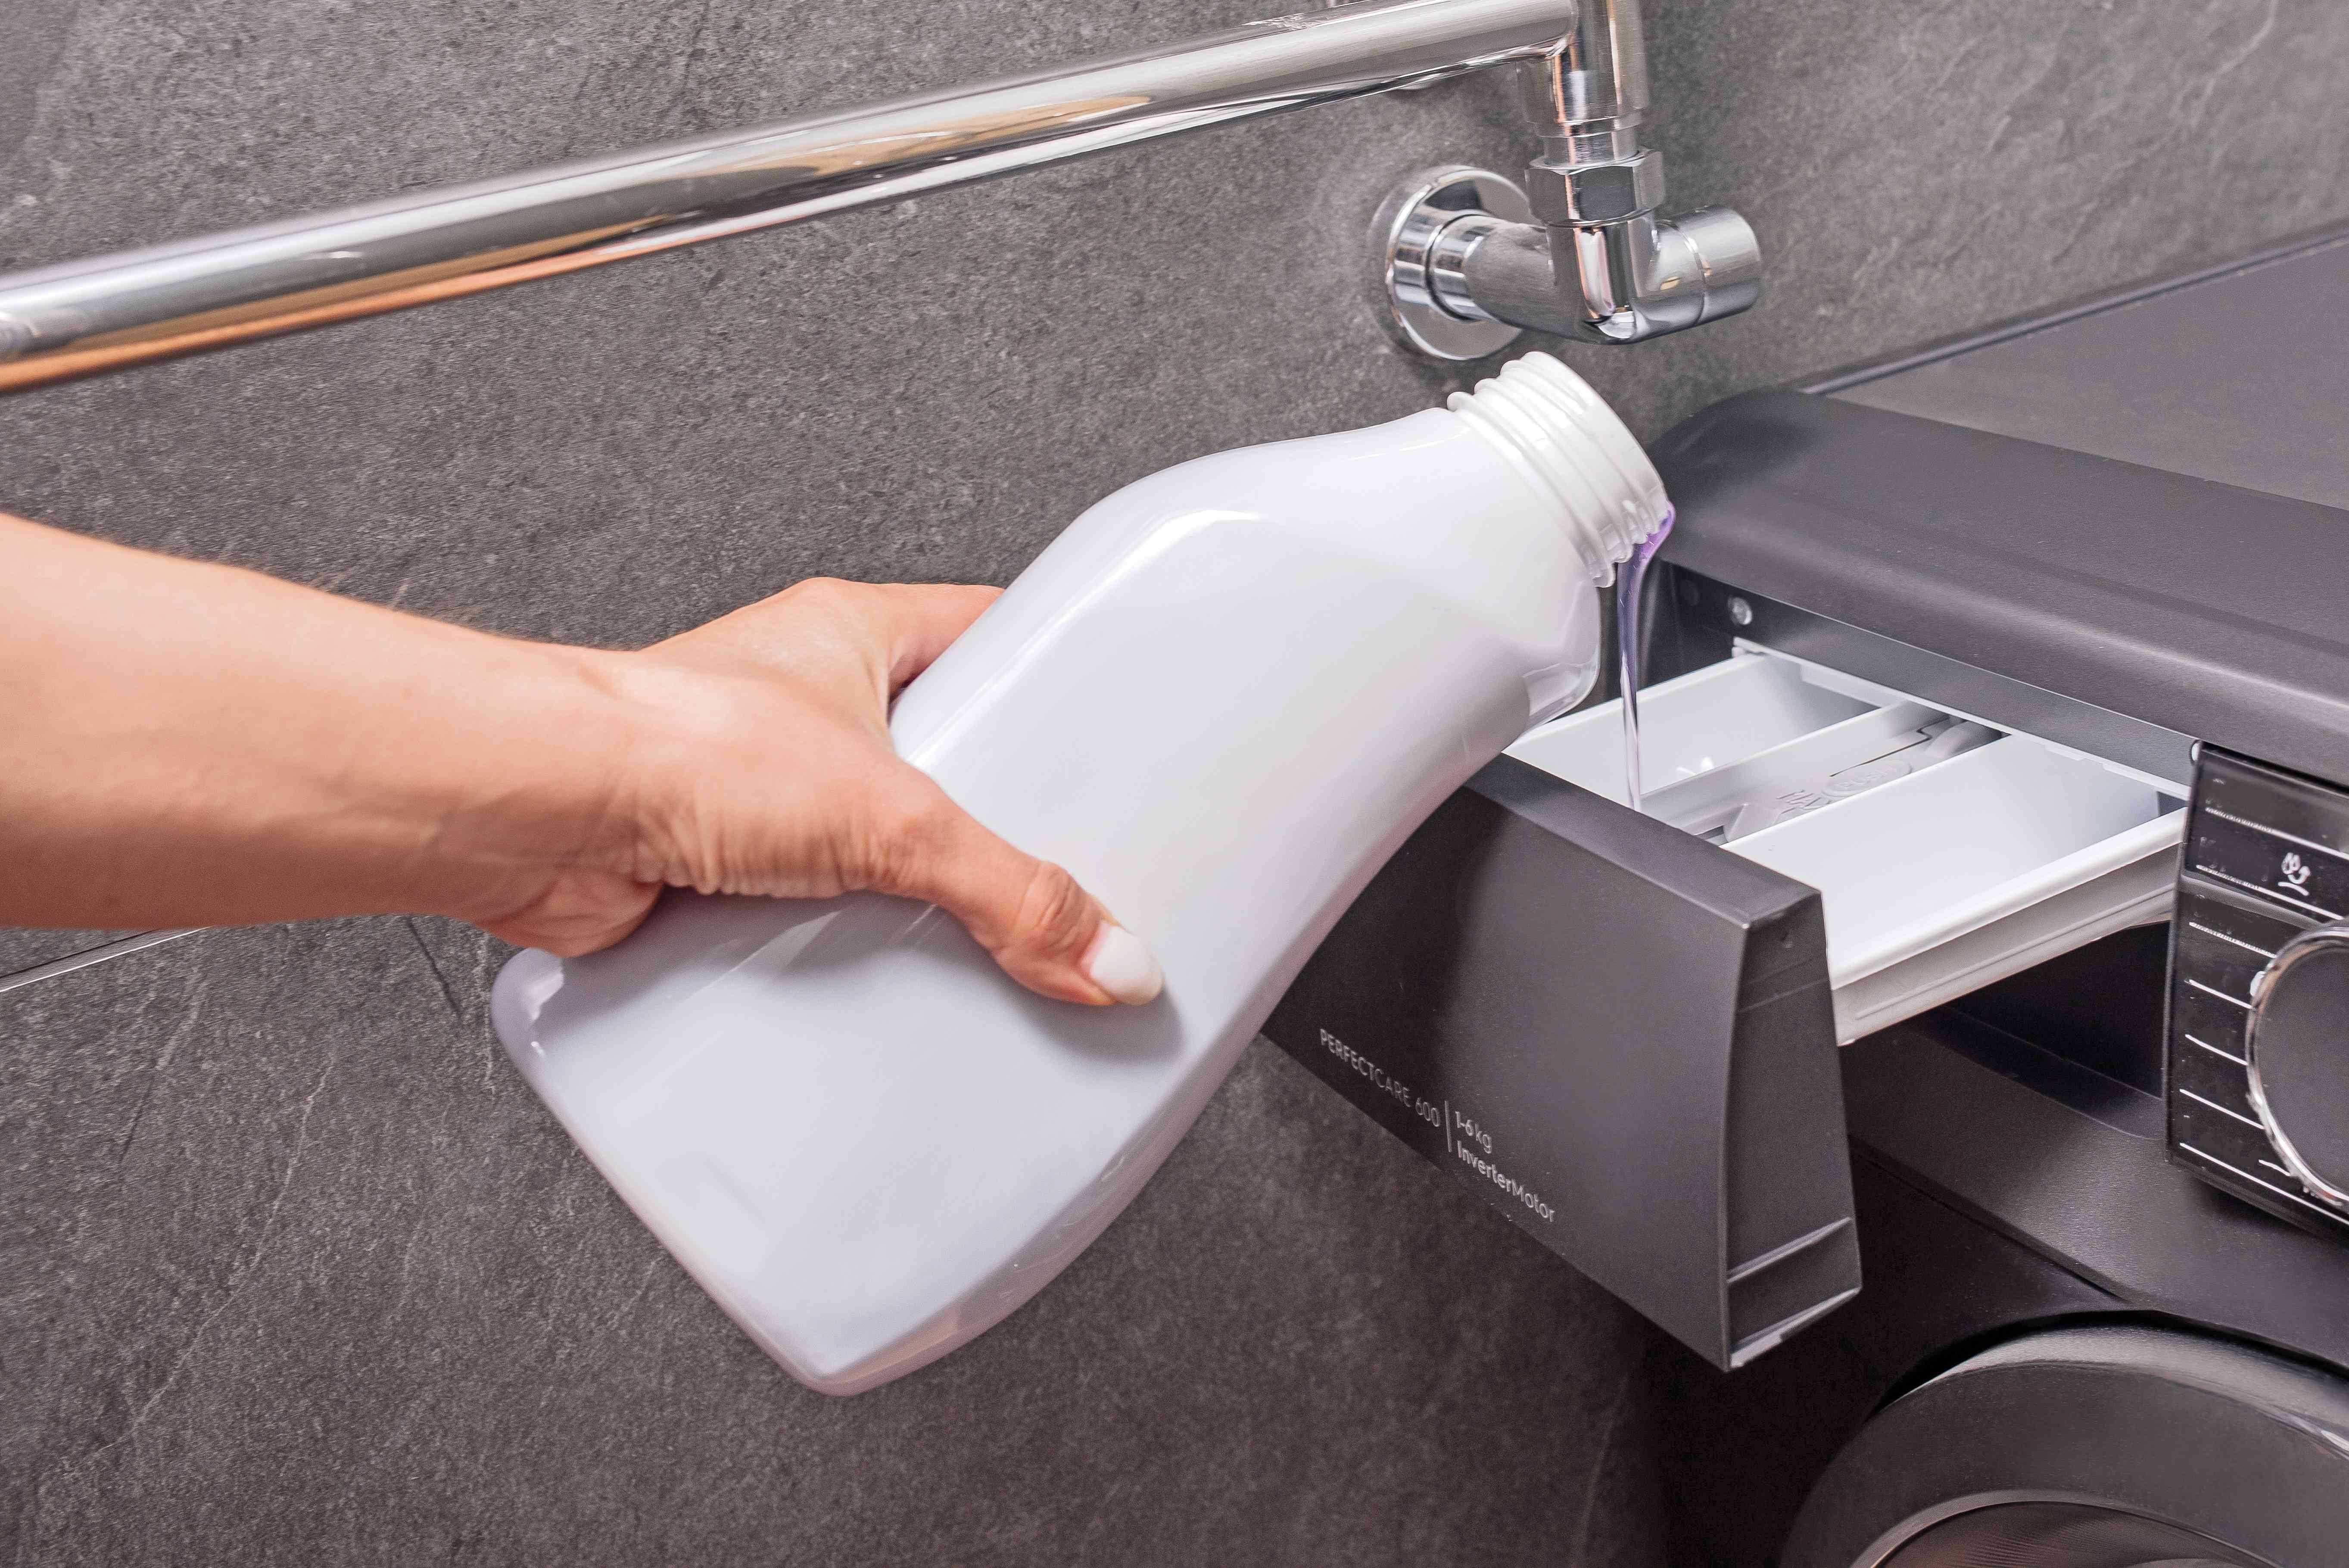 Someone adding chlorine bleach to a washer dispenser